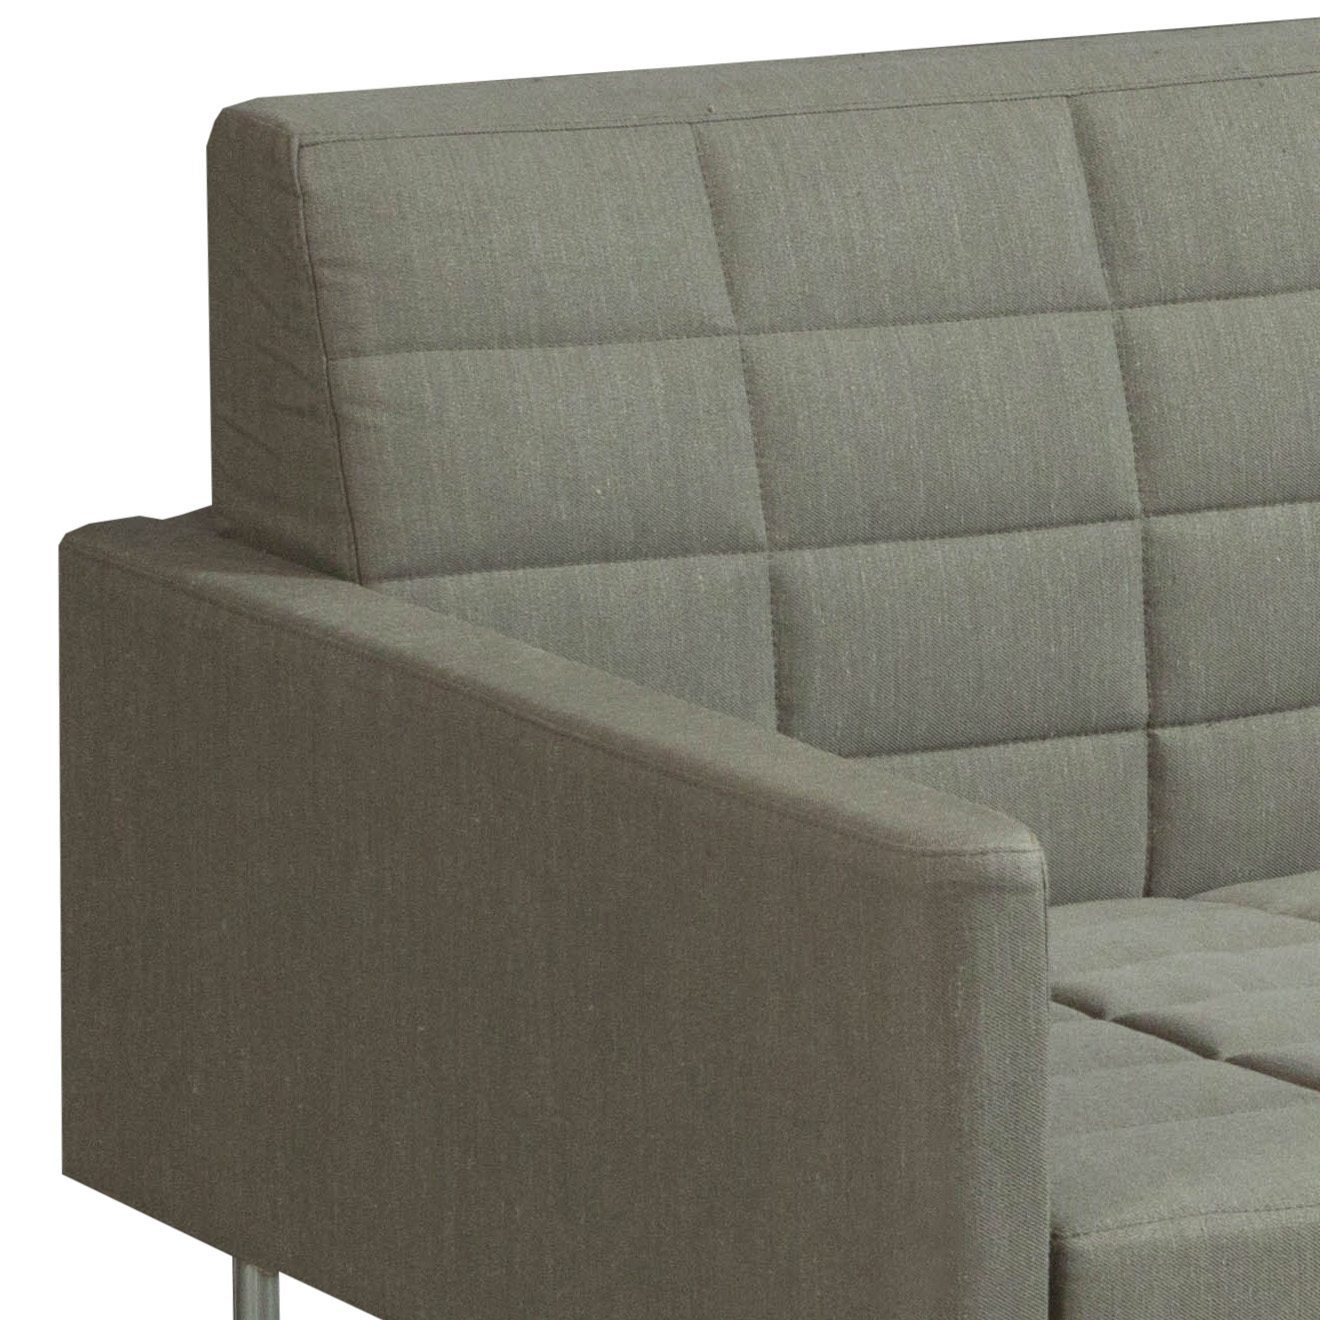 Herman Miller Geiger Tuxedo Used Lounge Chair ...